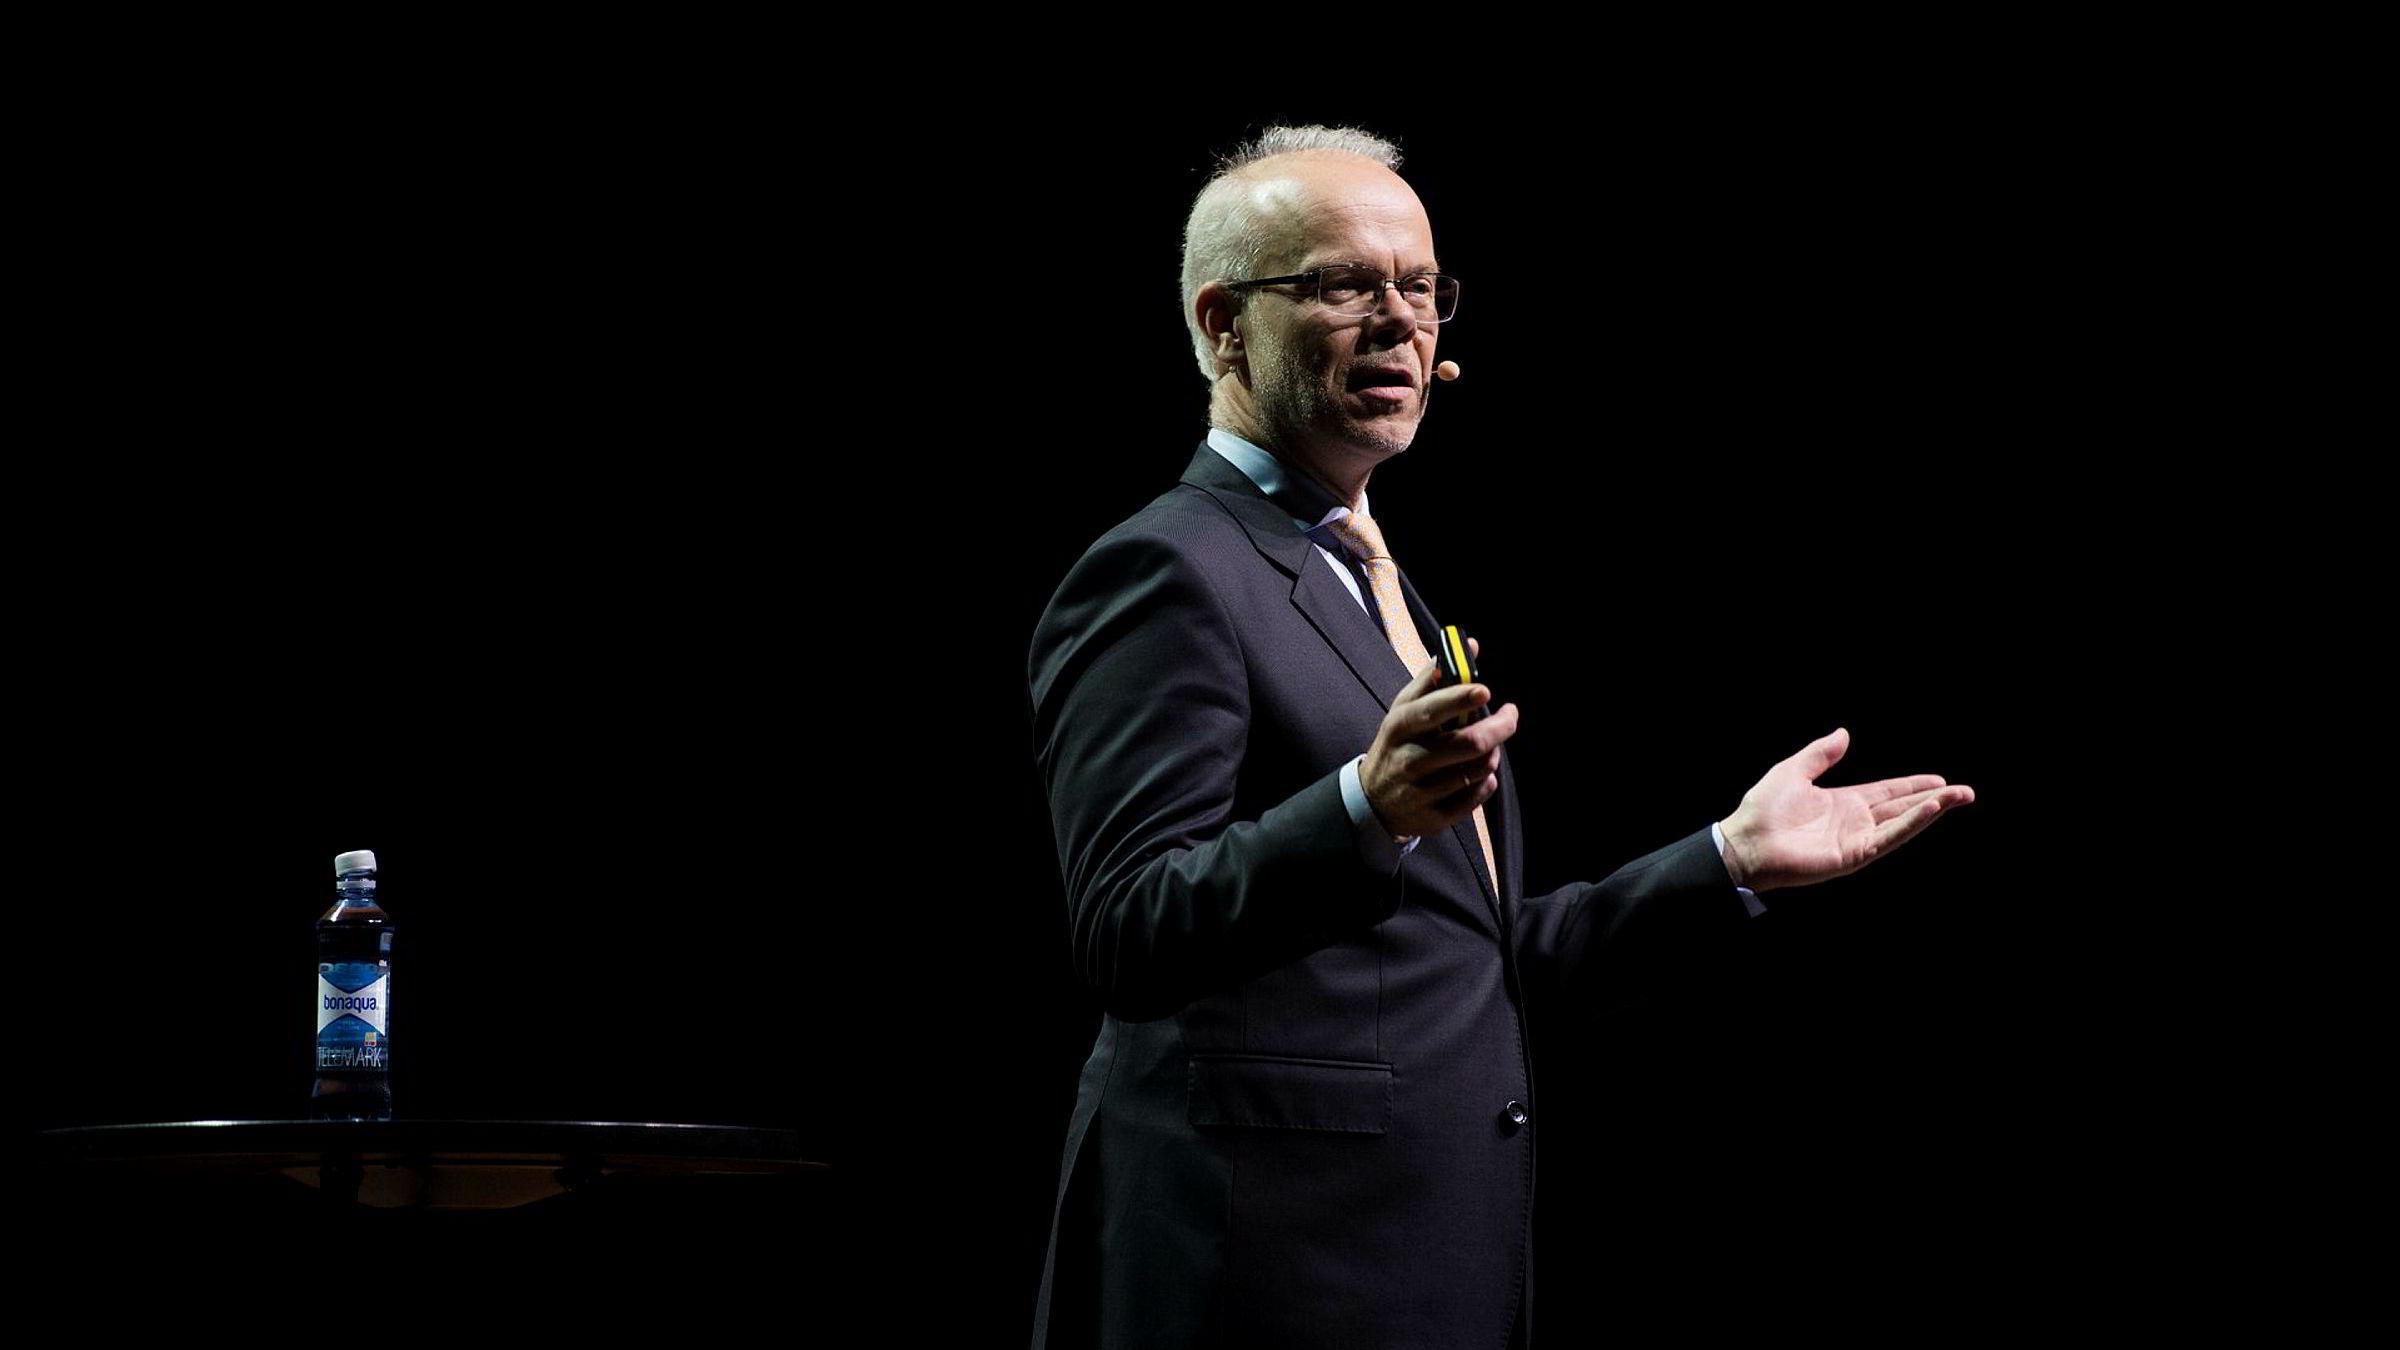 Googles norgessjef Jan Grønbech spår en lysere fremtid for norsk journalistikk. – Det er overgangen fra gammel til ny som fremstår som vanskelig nå, skriver Grønbech.